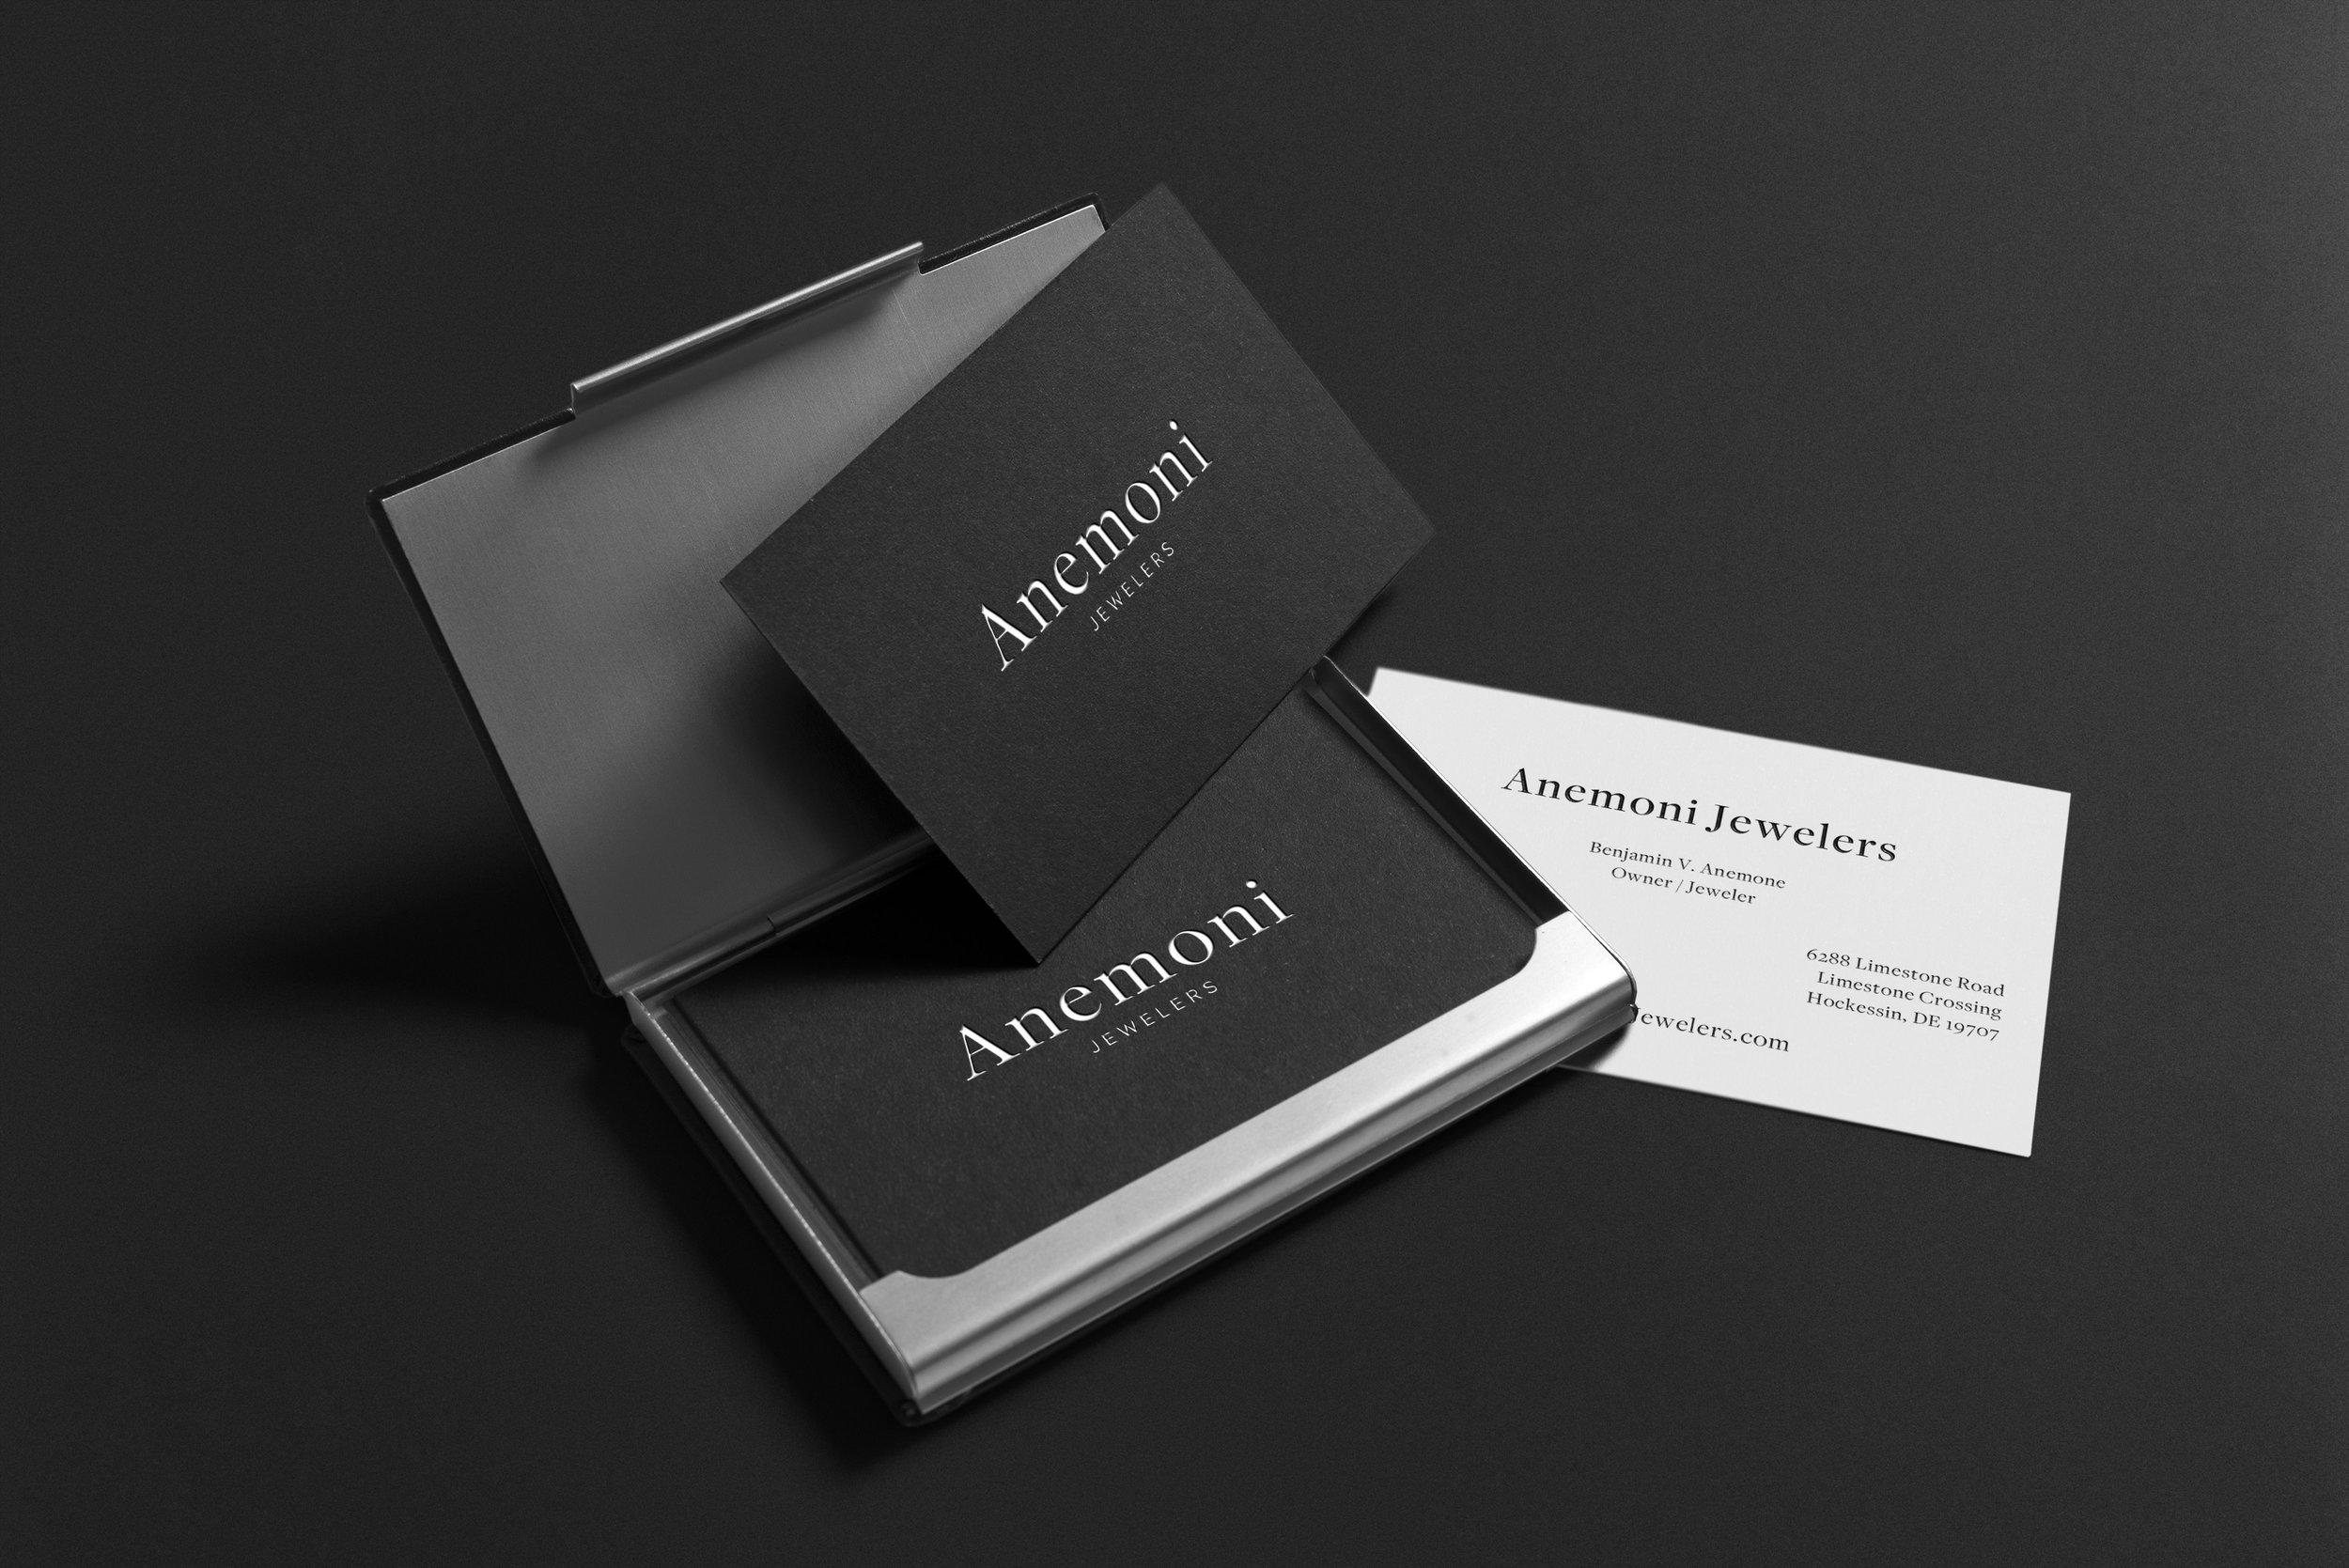 Artful-Union-Anemoni-Jewelers-Black-White-Emboss-Business-Cards-04.jpg